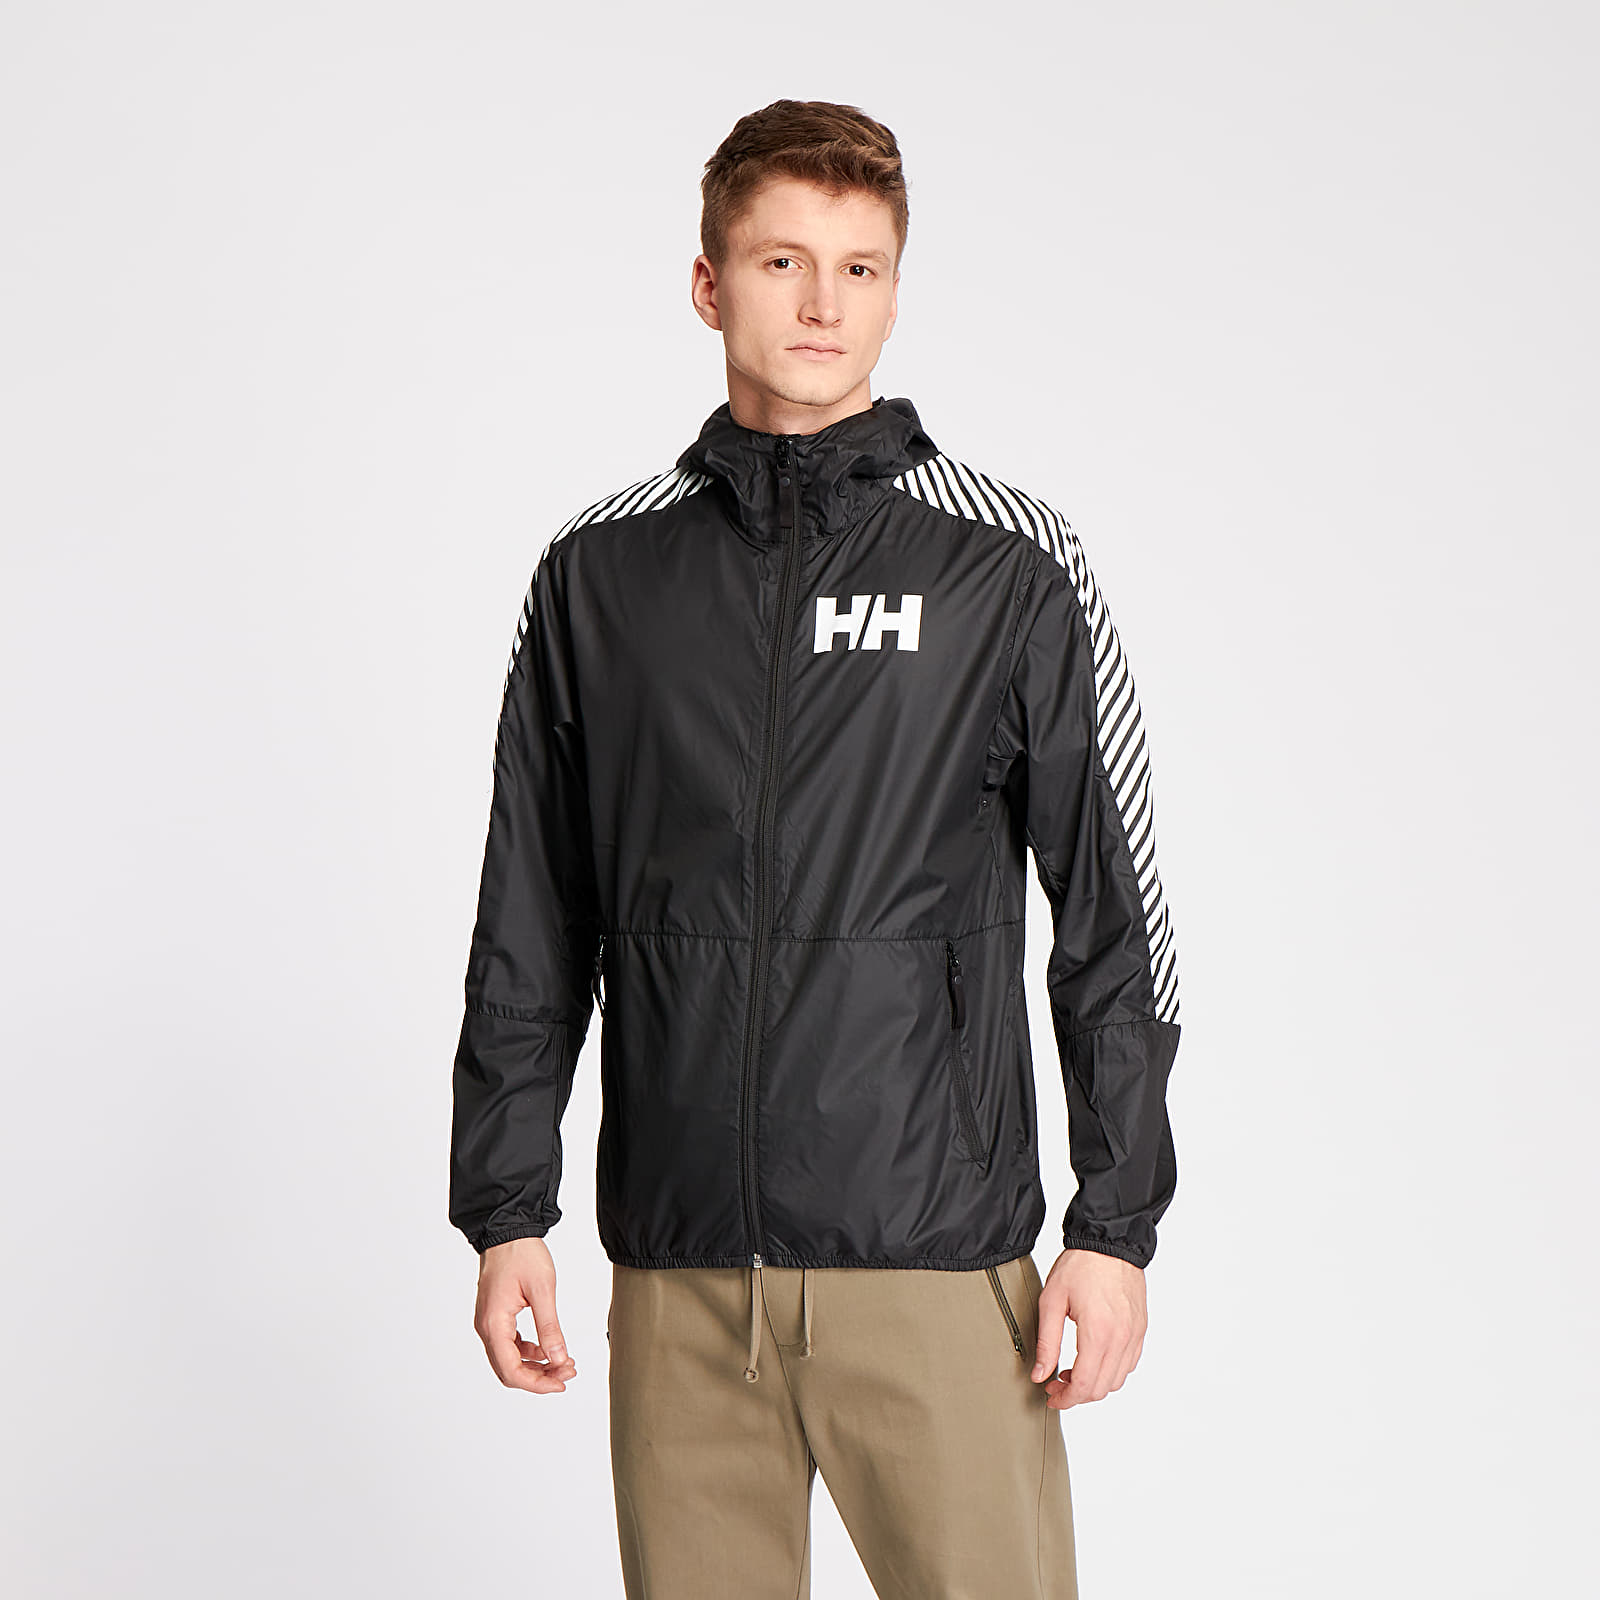 Helly Hansen Active Wind Jacket